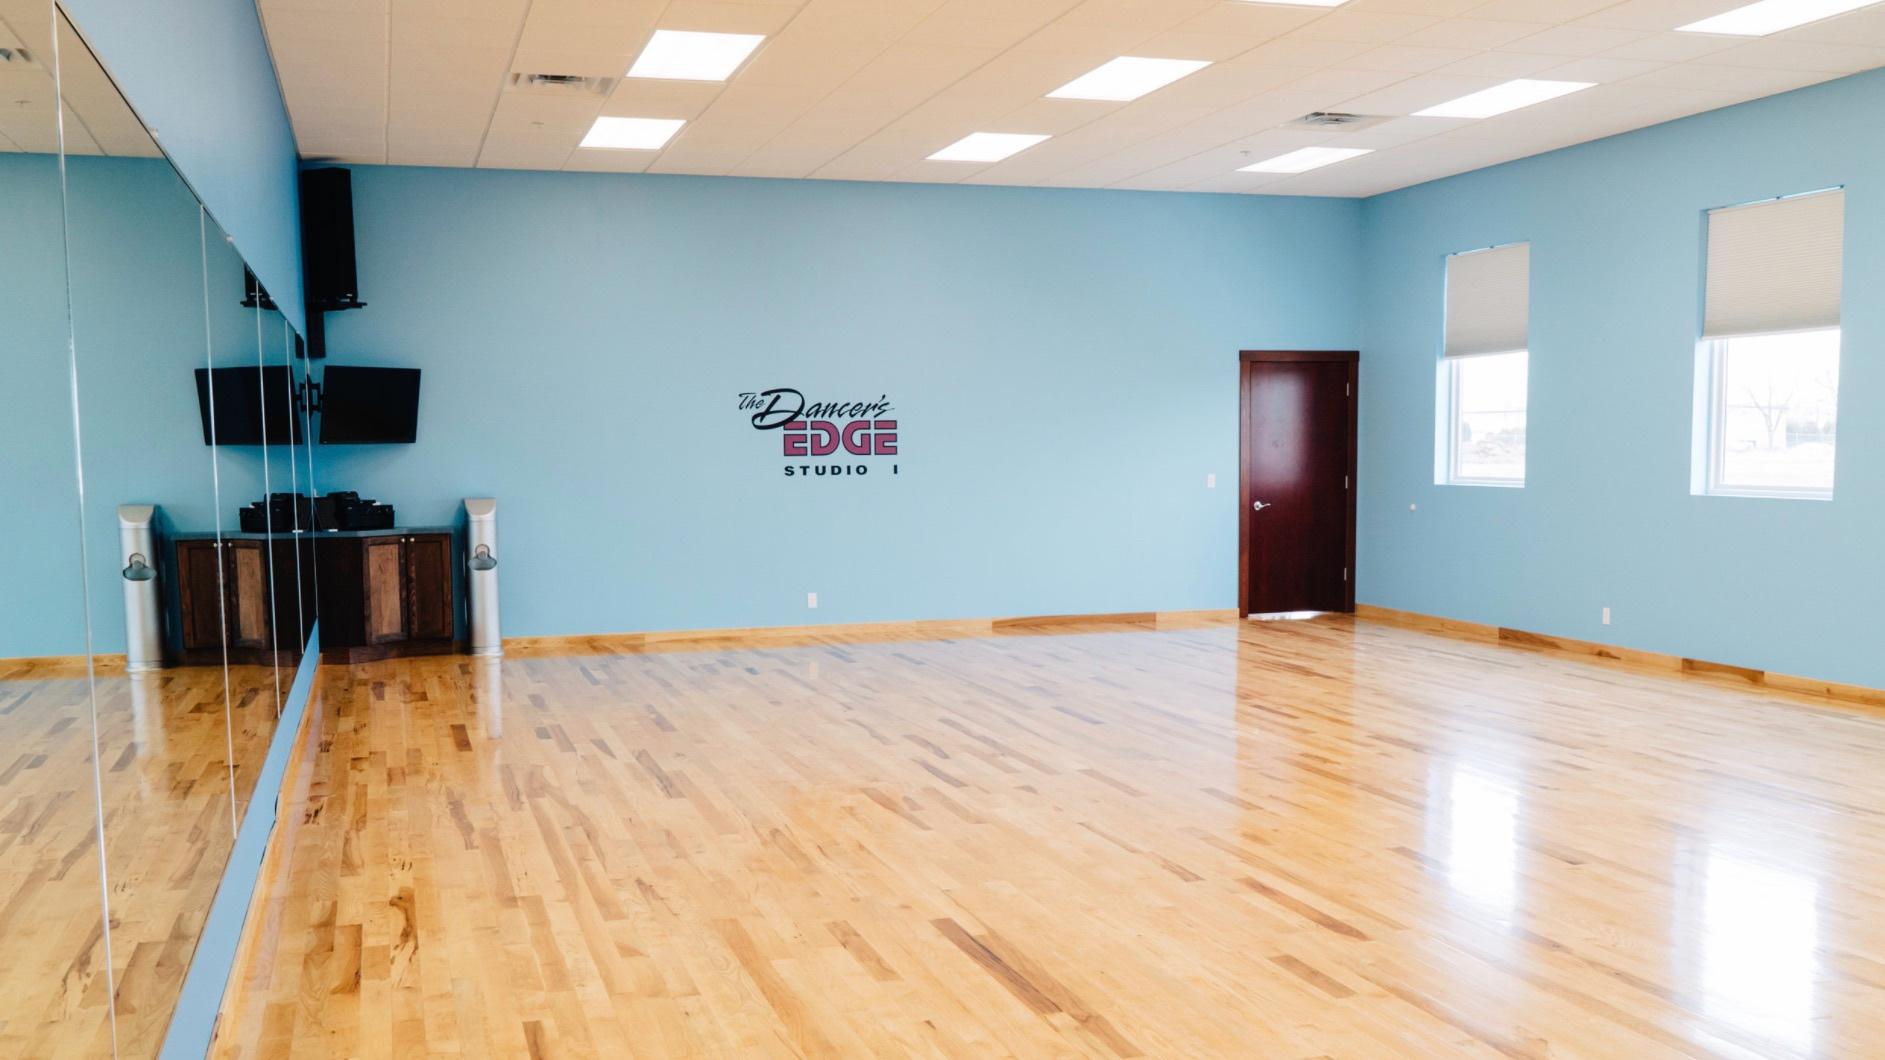 The Dancer's EDGE Tap Studio